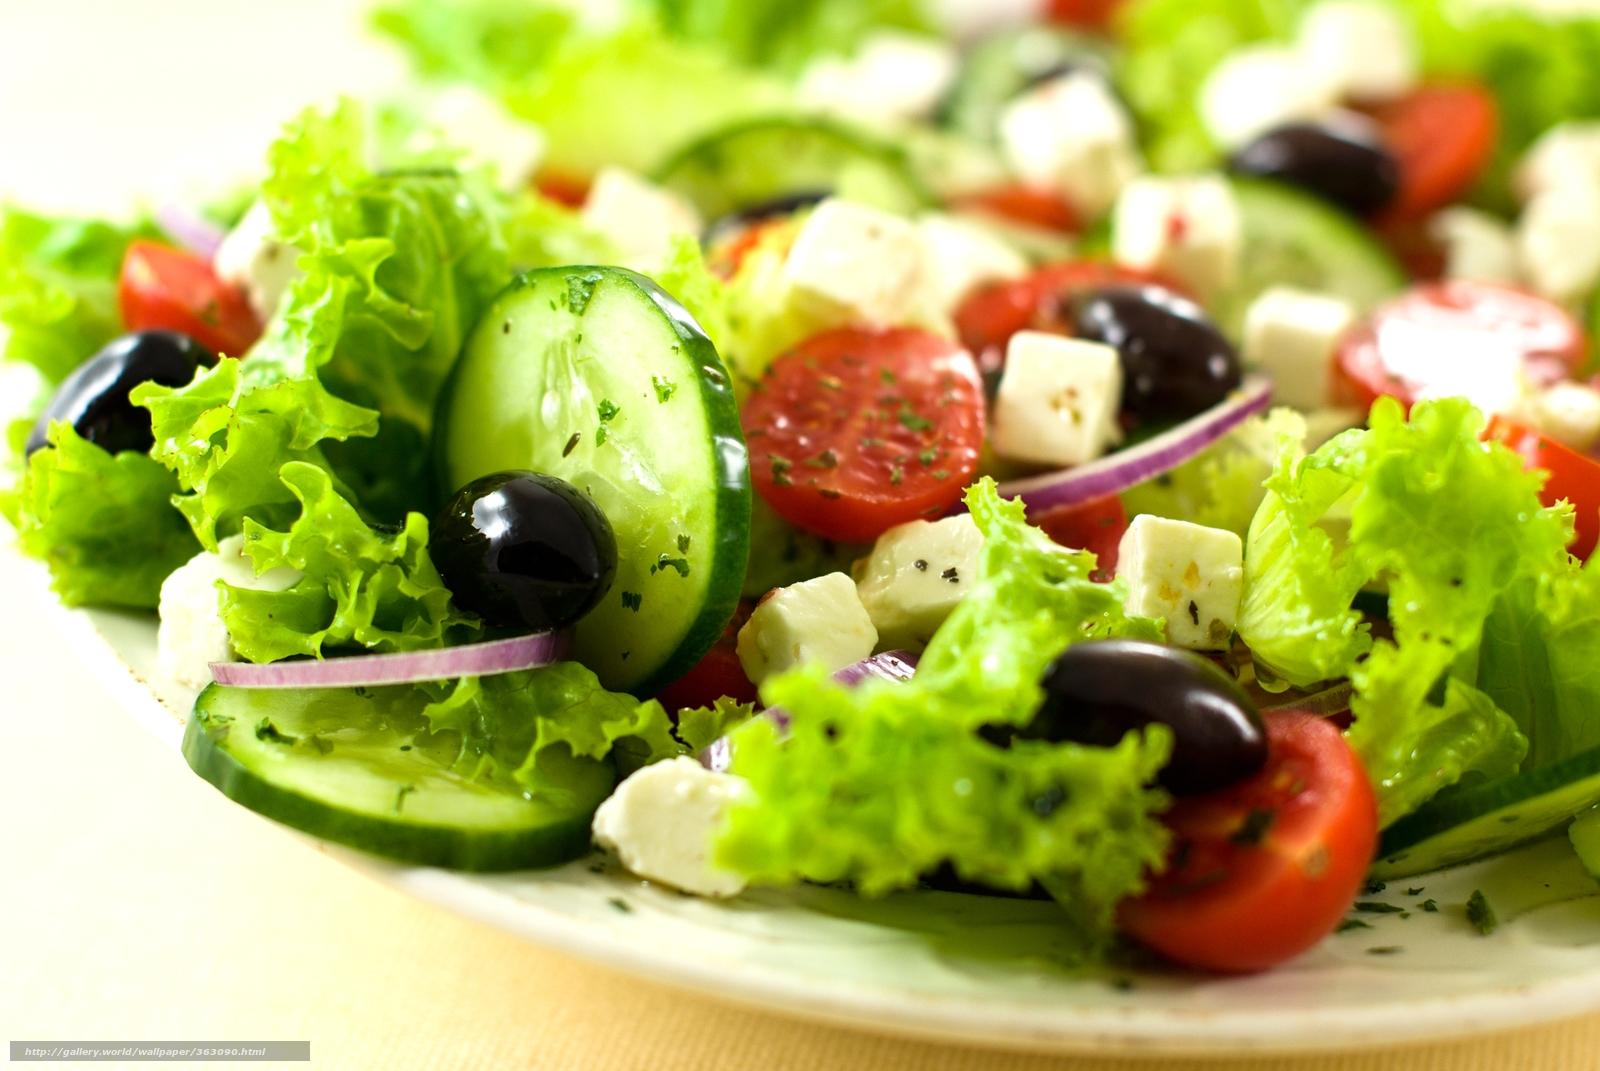 http://st.gdefon.ru/wallpapers_original/wallpapers/363090_salat_ogurcy_masliny_luk_pomidory_syr_4256x2848_(www.GdeFon.ru).jpg